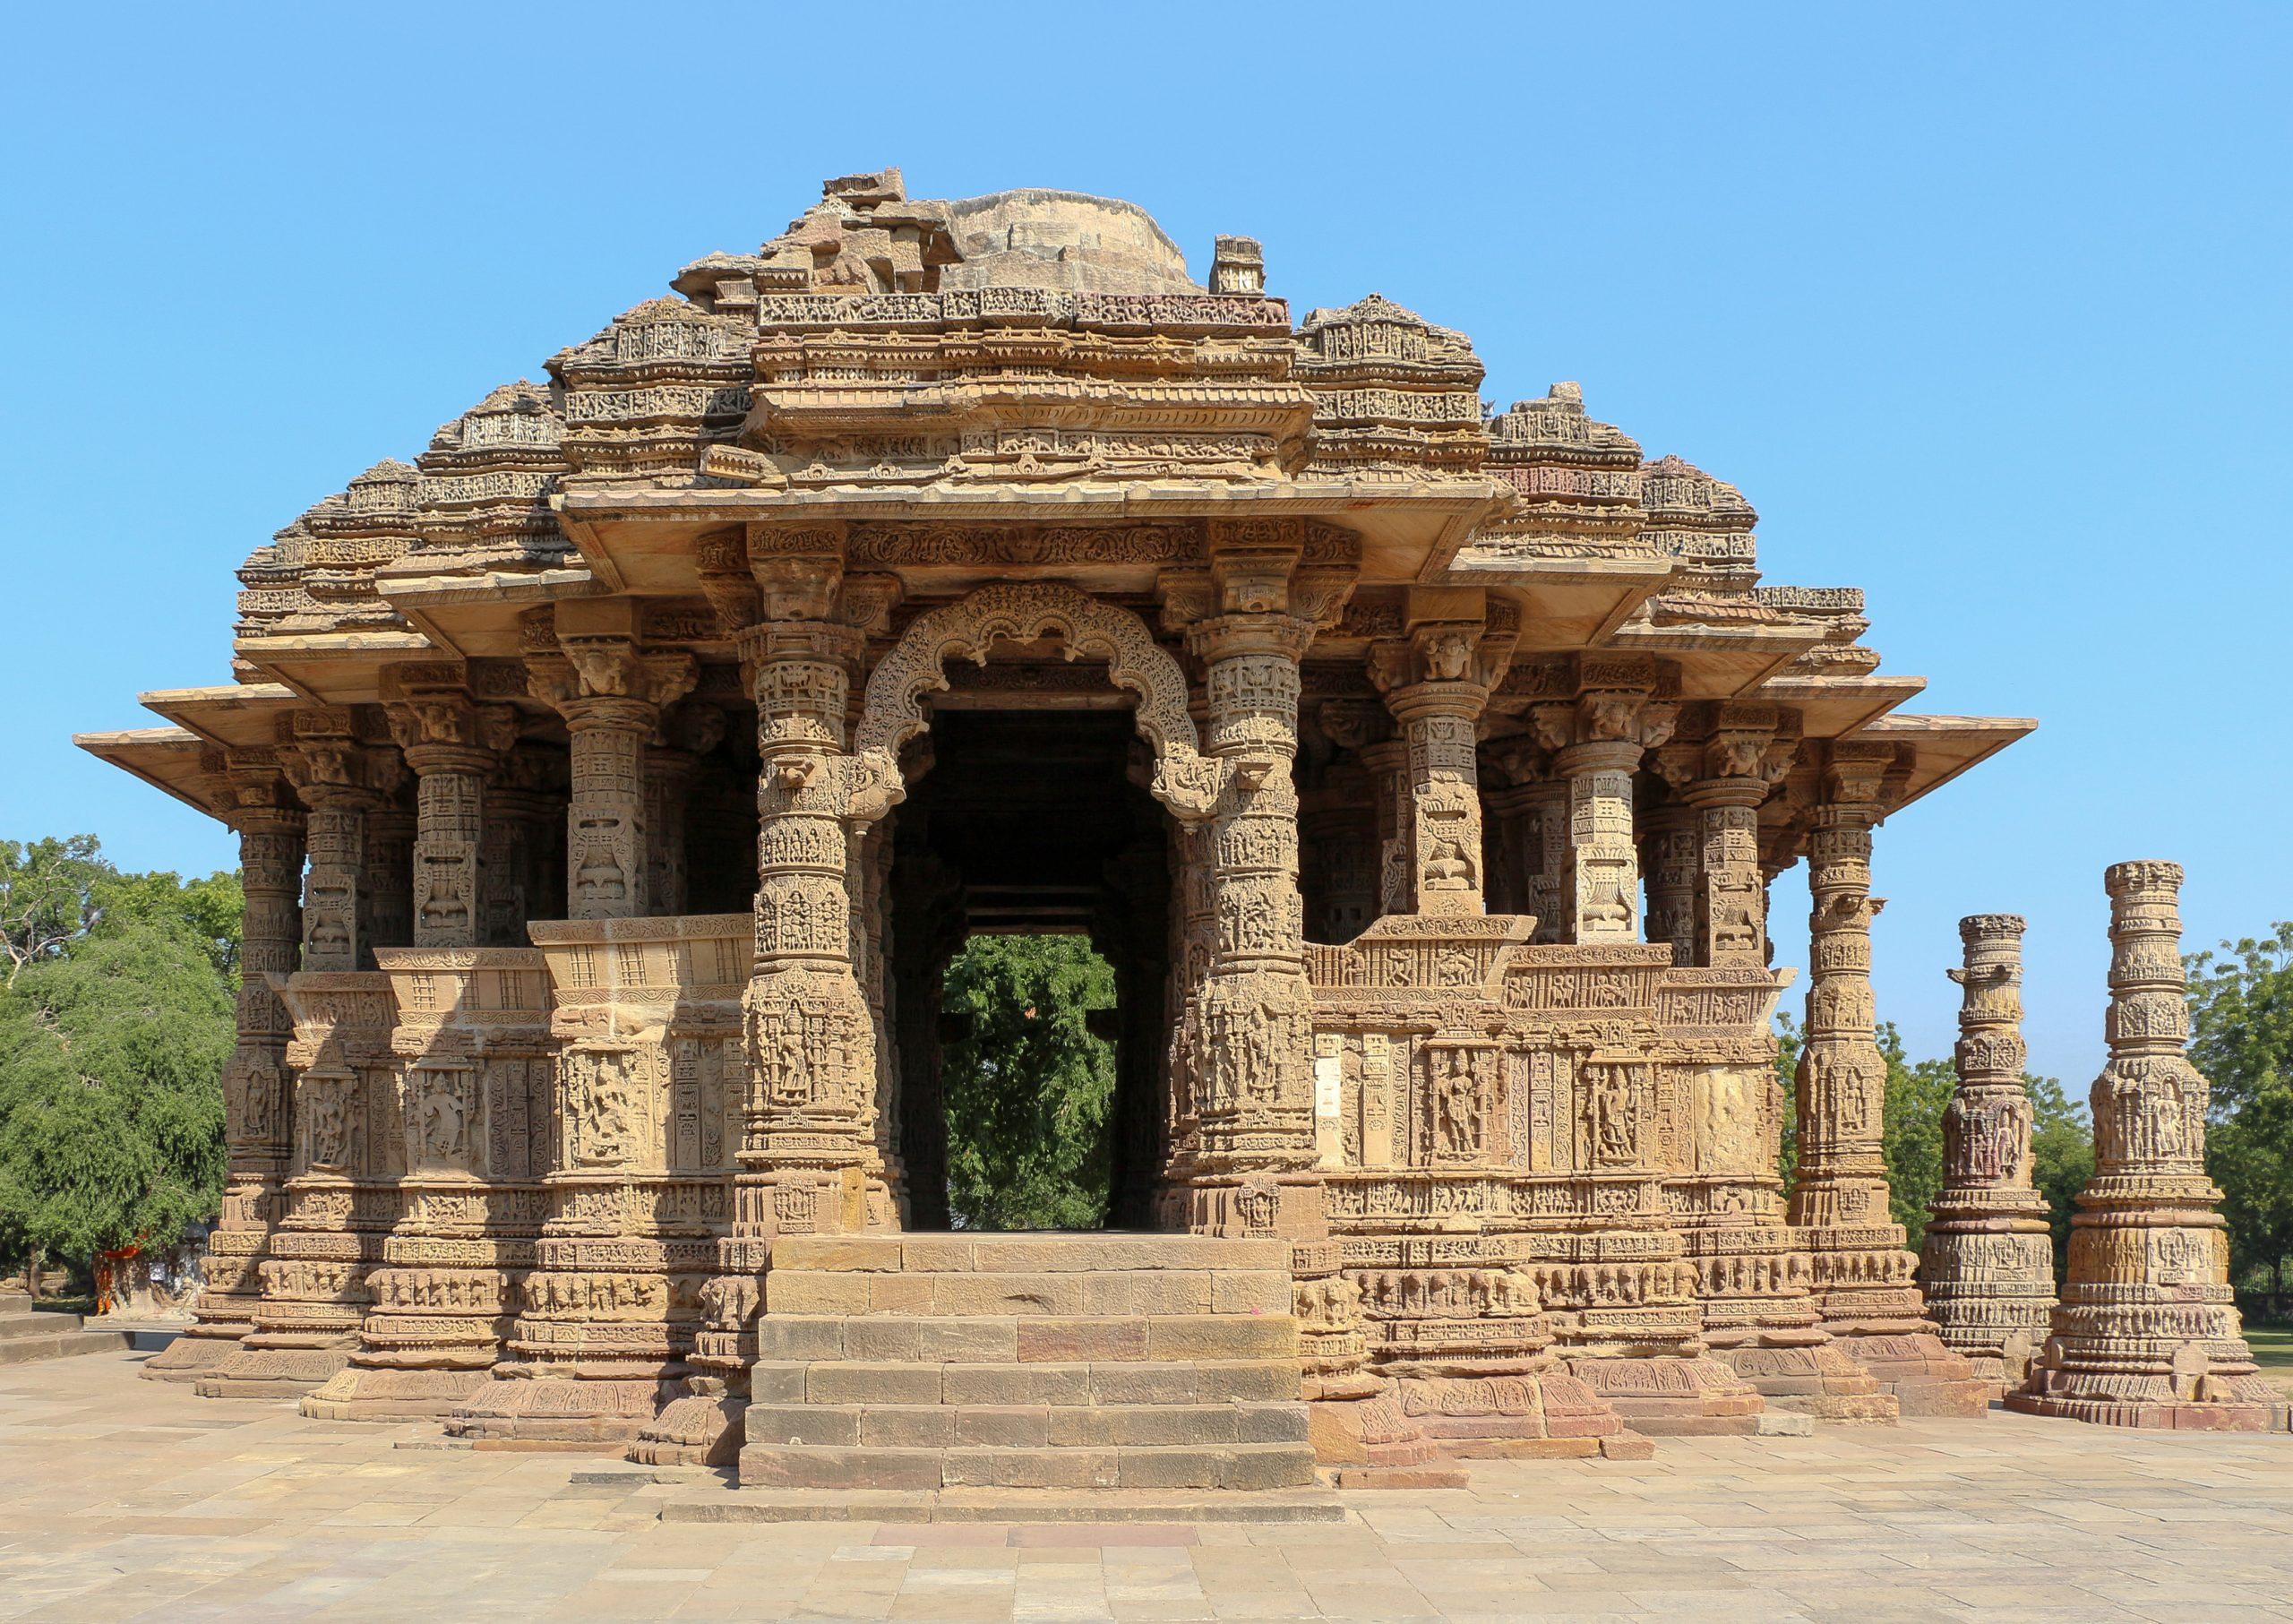 Modhera Amazing Weekend Getaway Near Ahmedabad